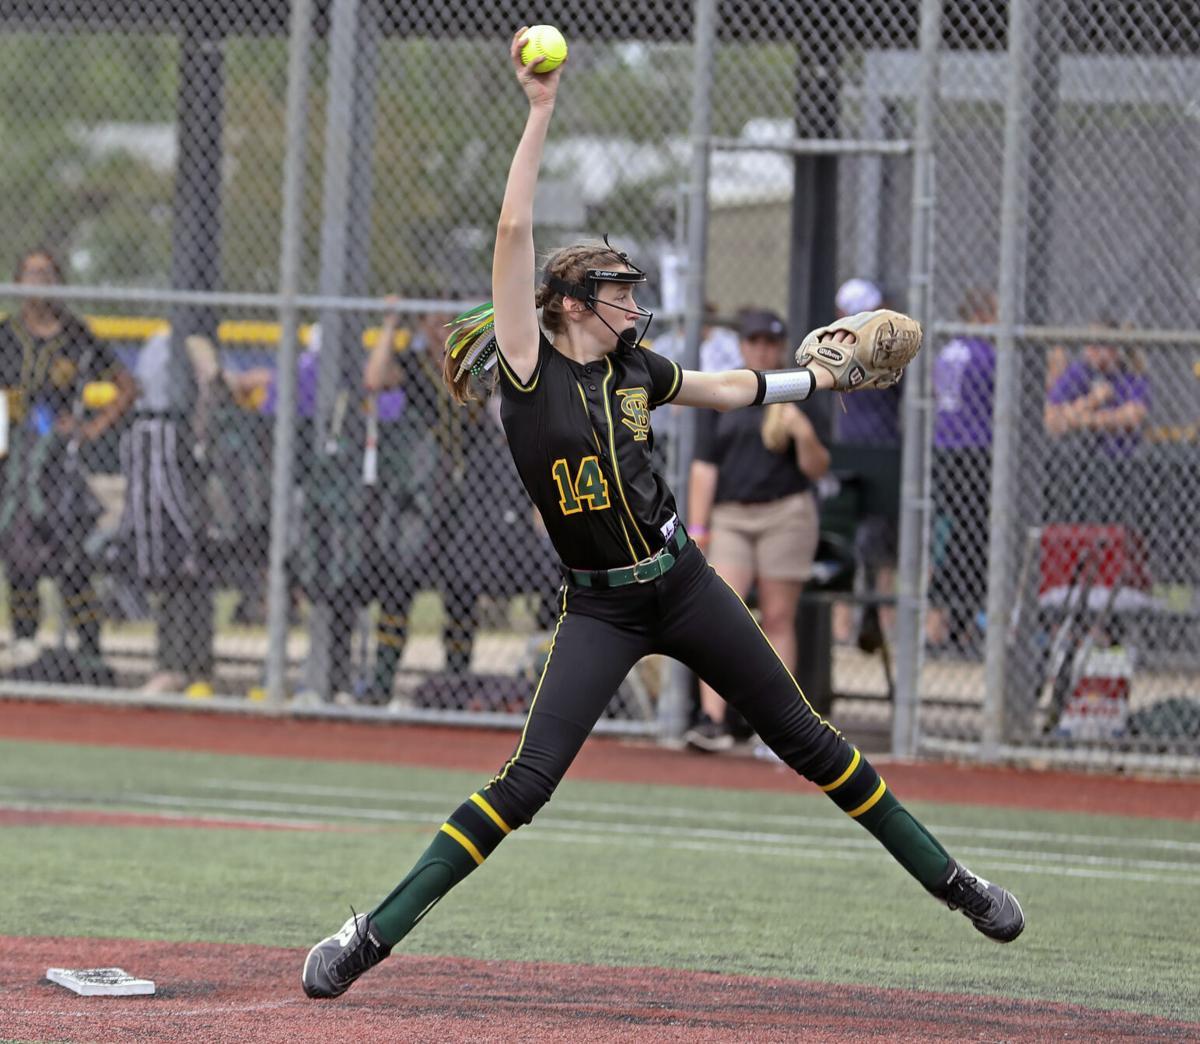 Rosepine vs. Doyle softball semifinal Katie Harper